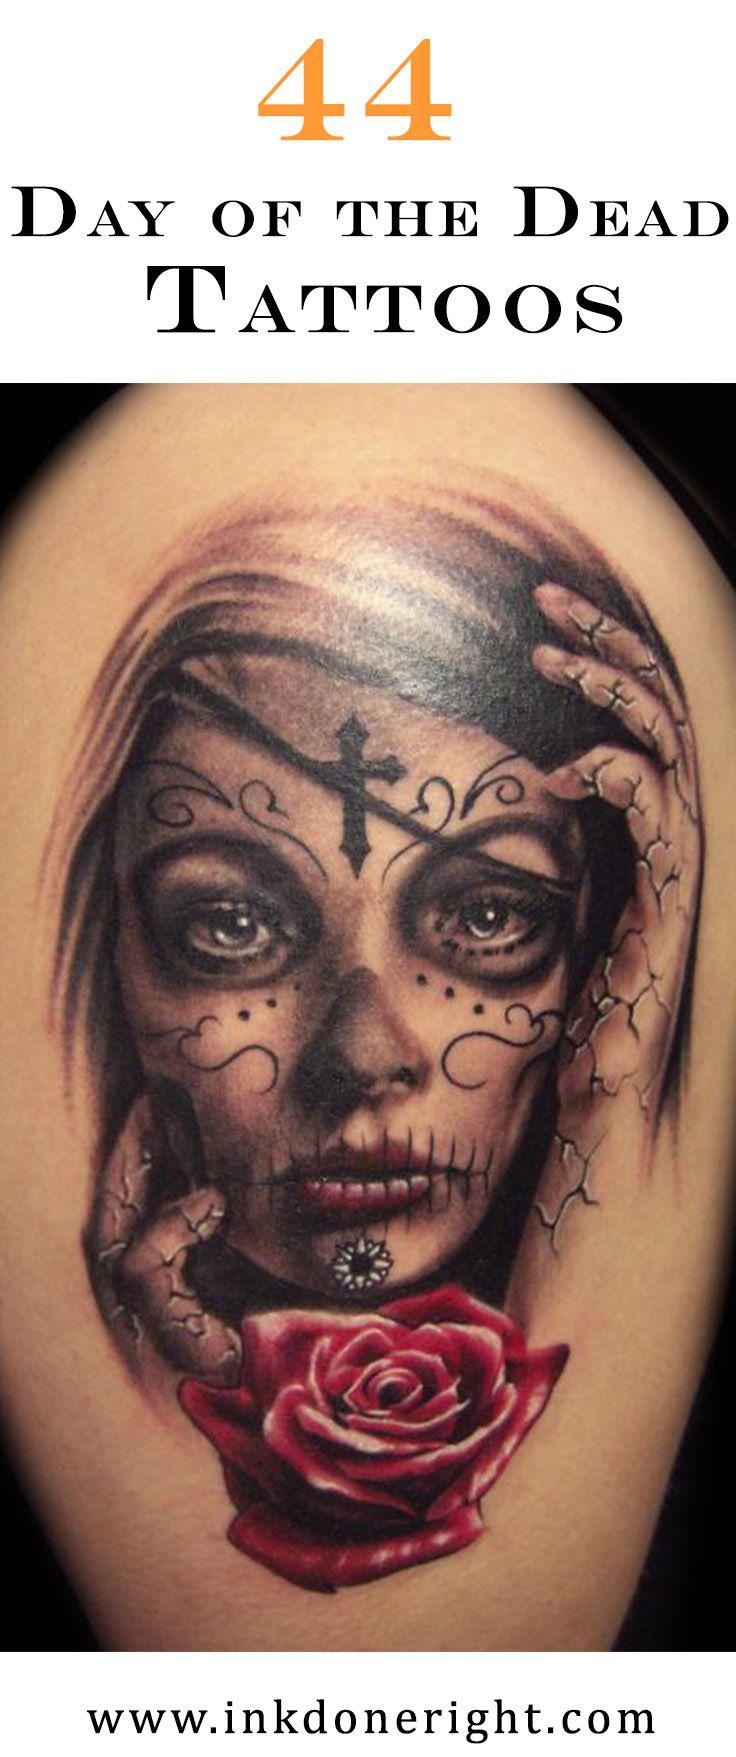 44 Day of the Dead Tattoos Gallery! Skull girl tattoo